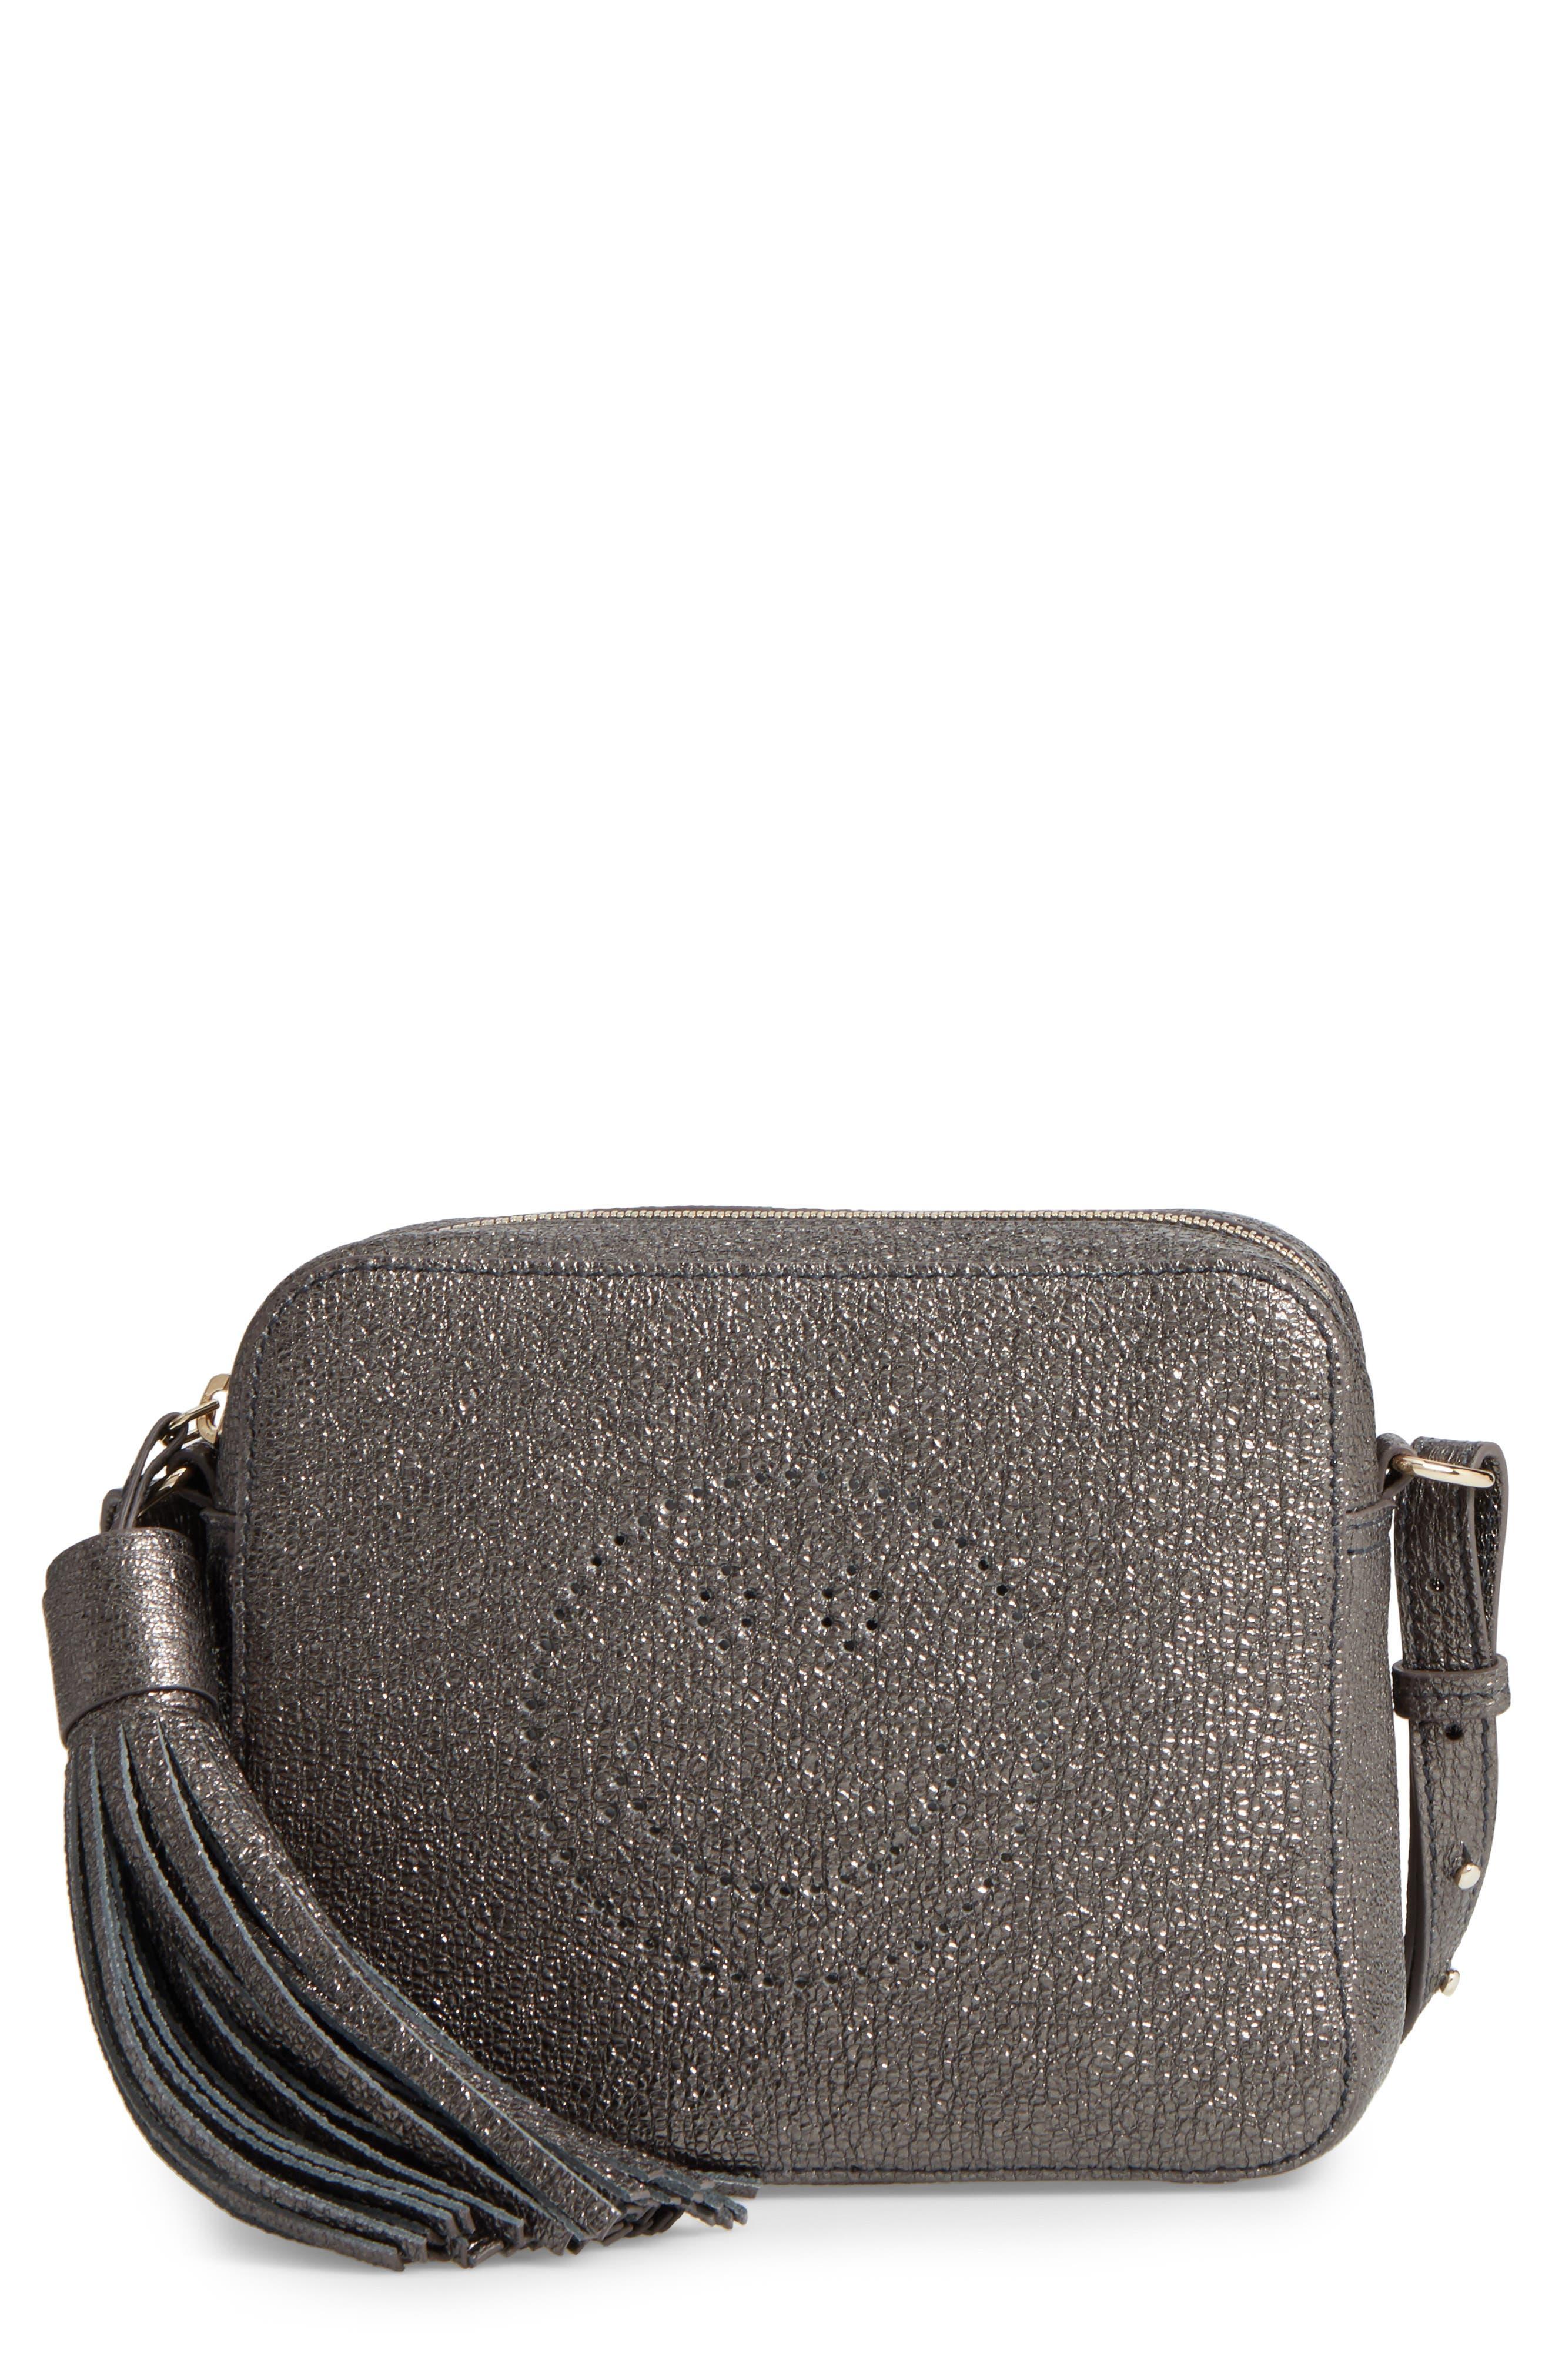 ANYA HINDMARCH Smiley Glitter Leather Crossbody Bag